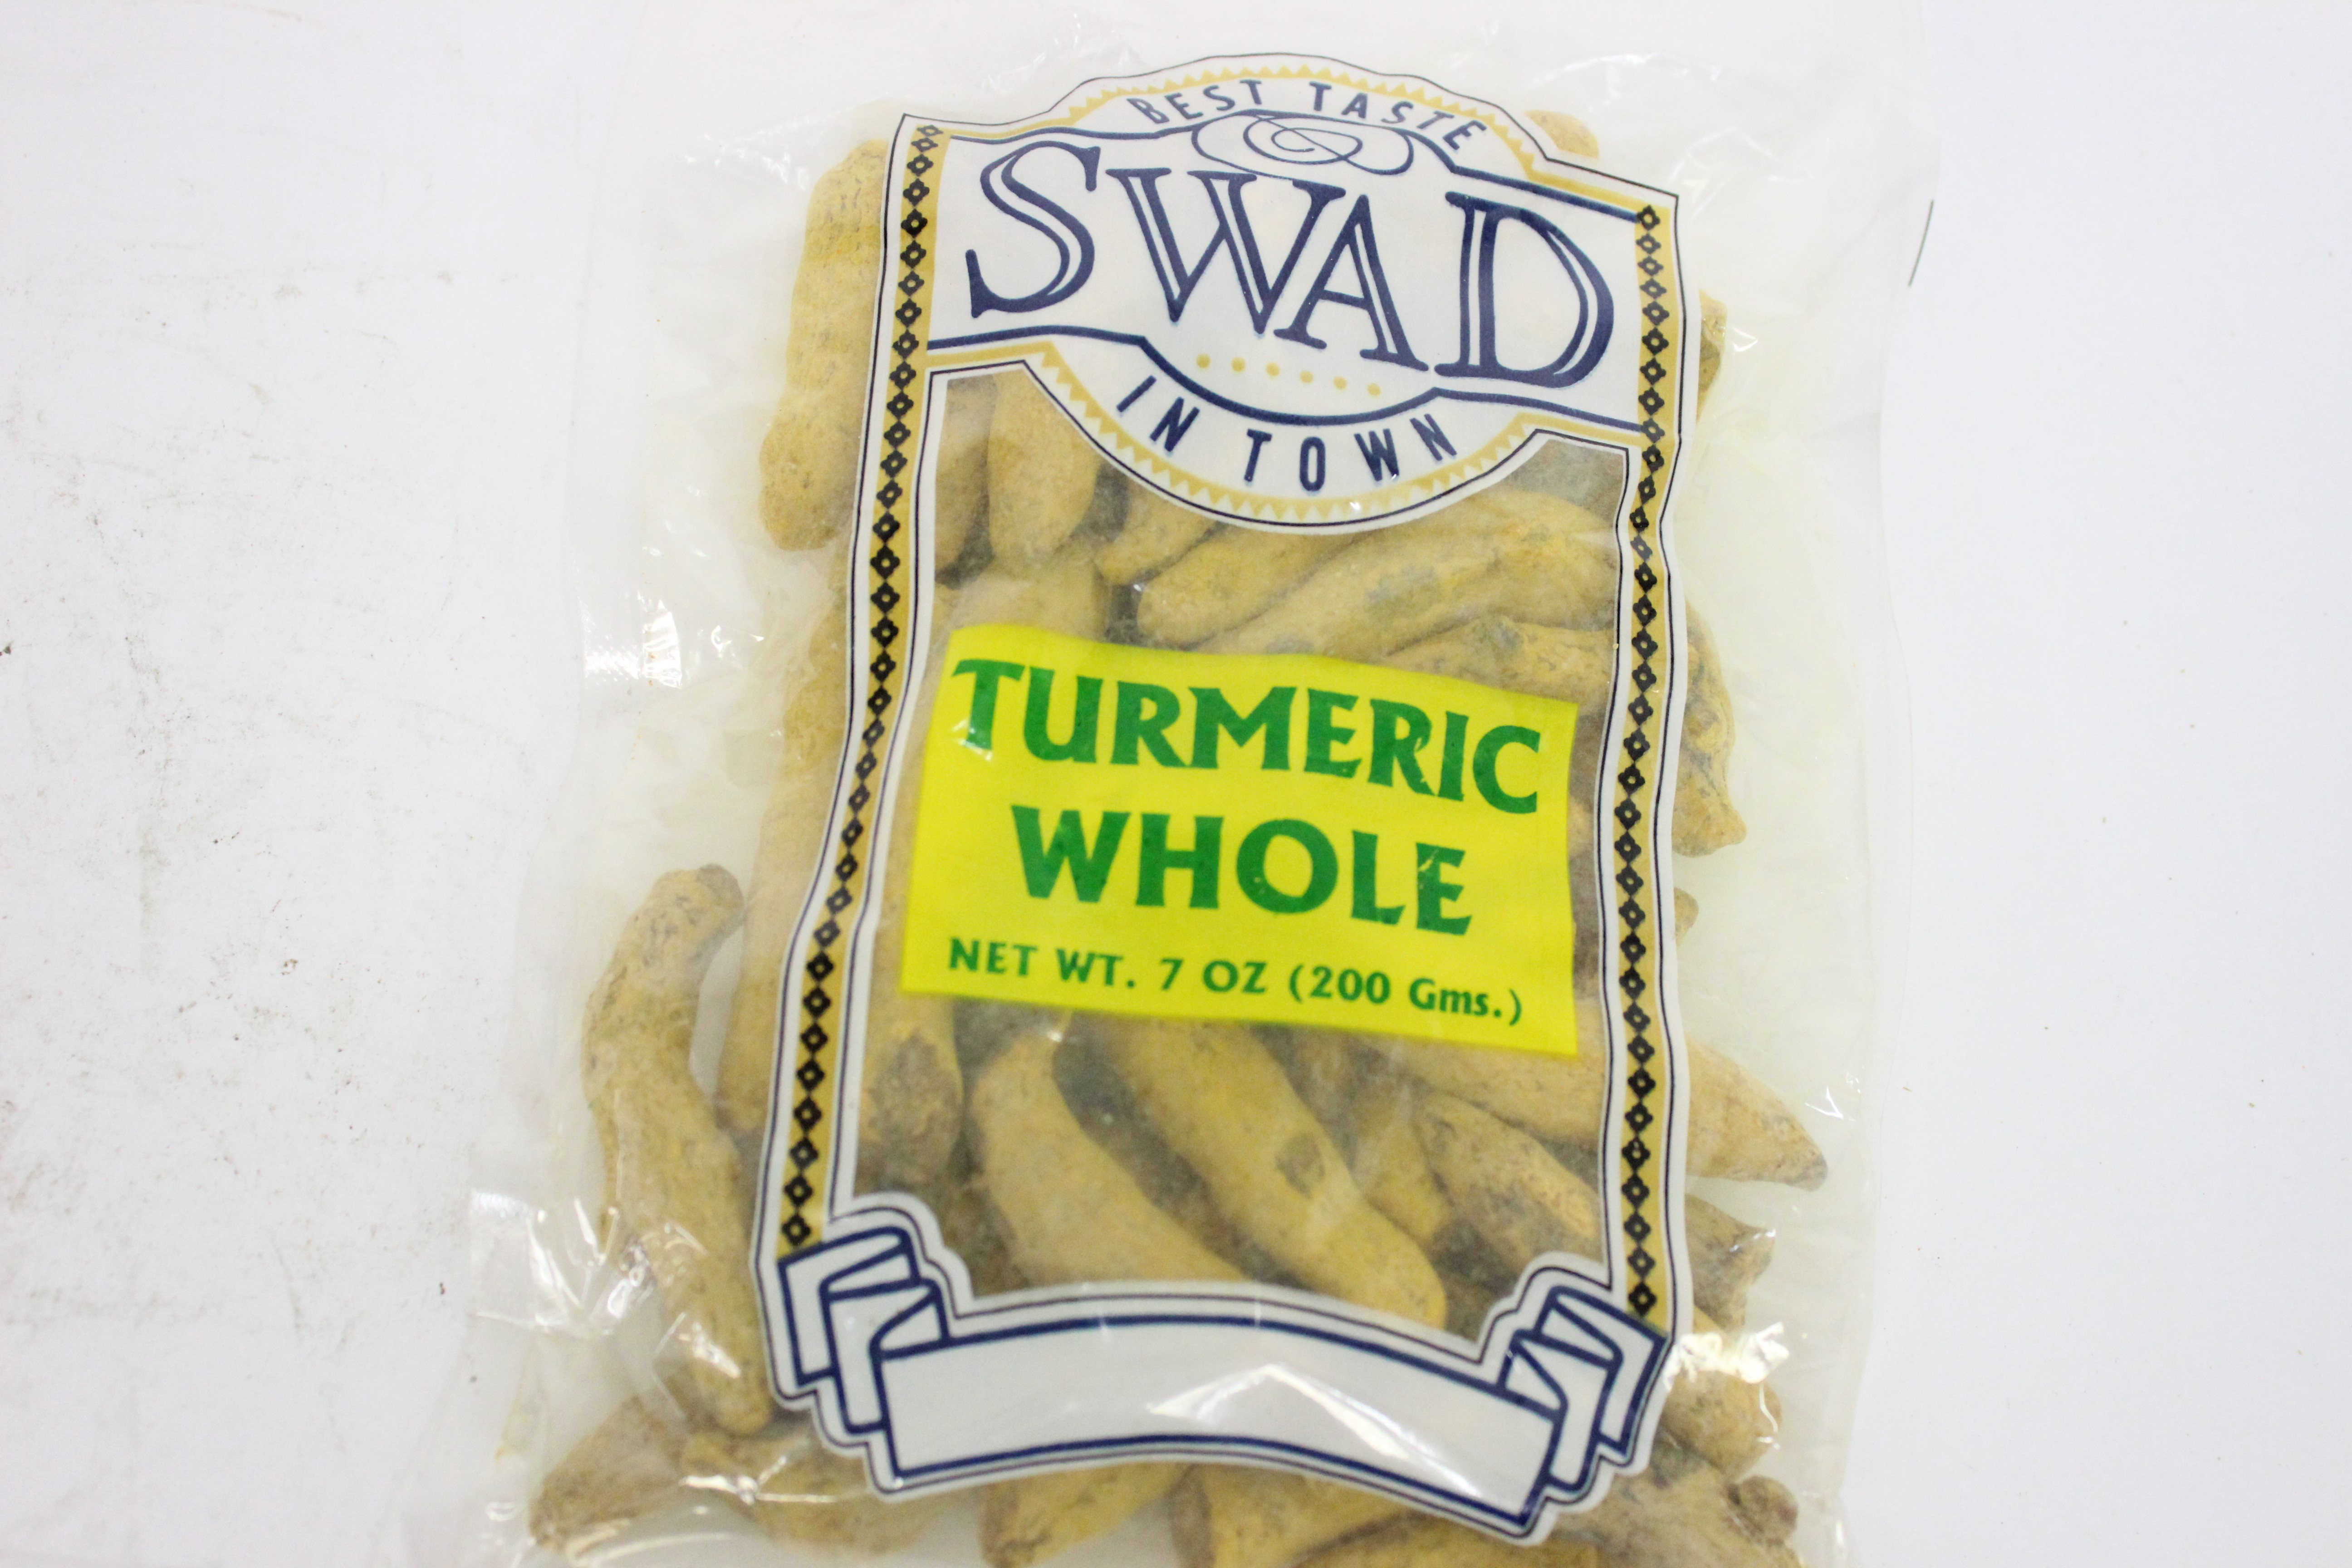 Turmeric Whole 7 0z